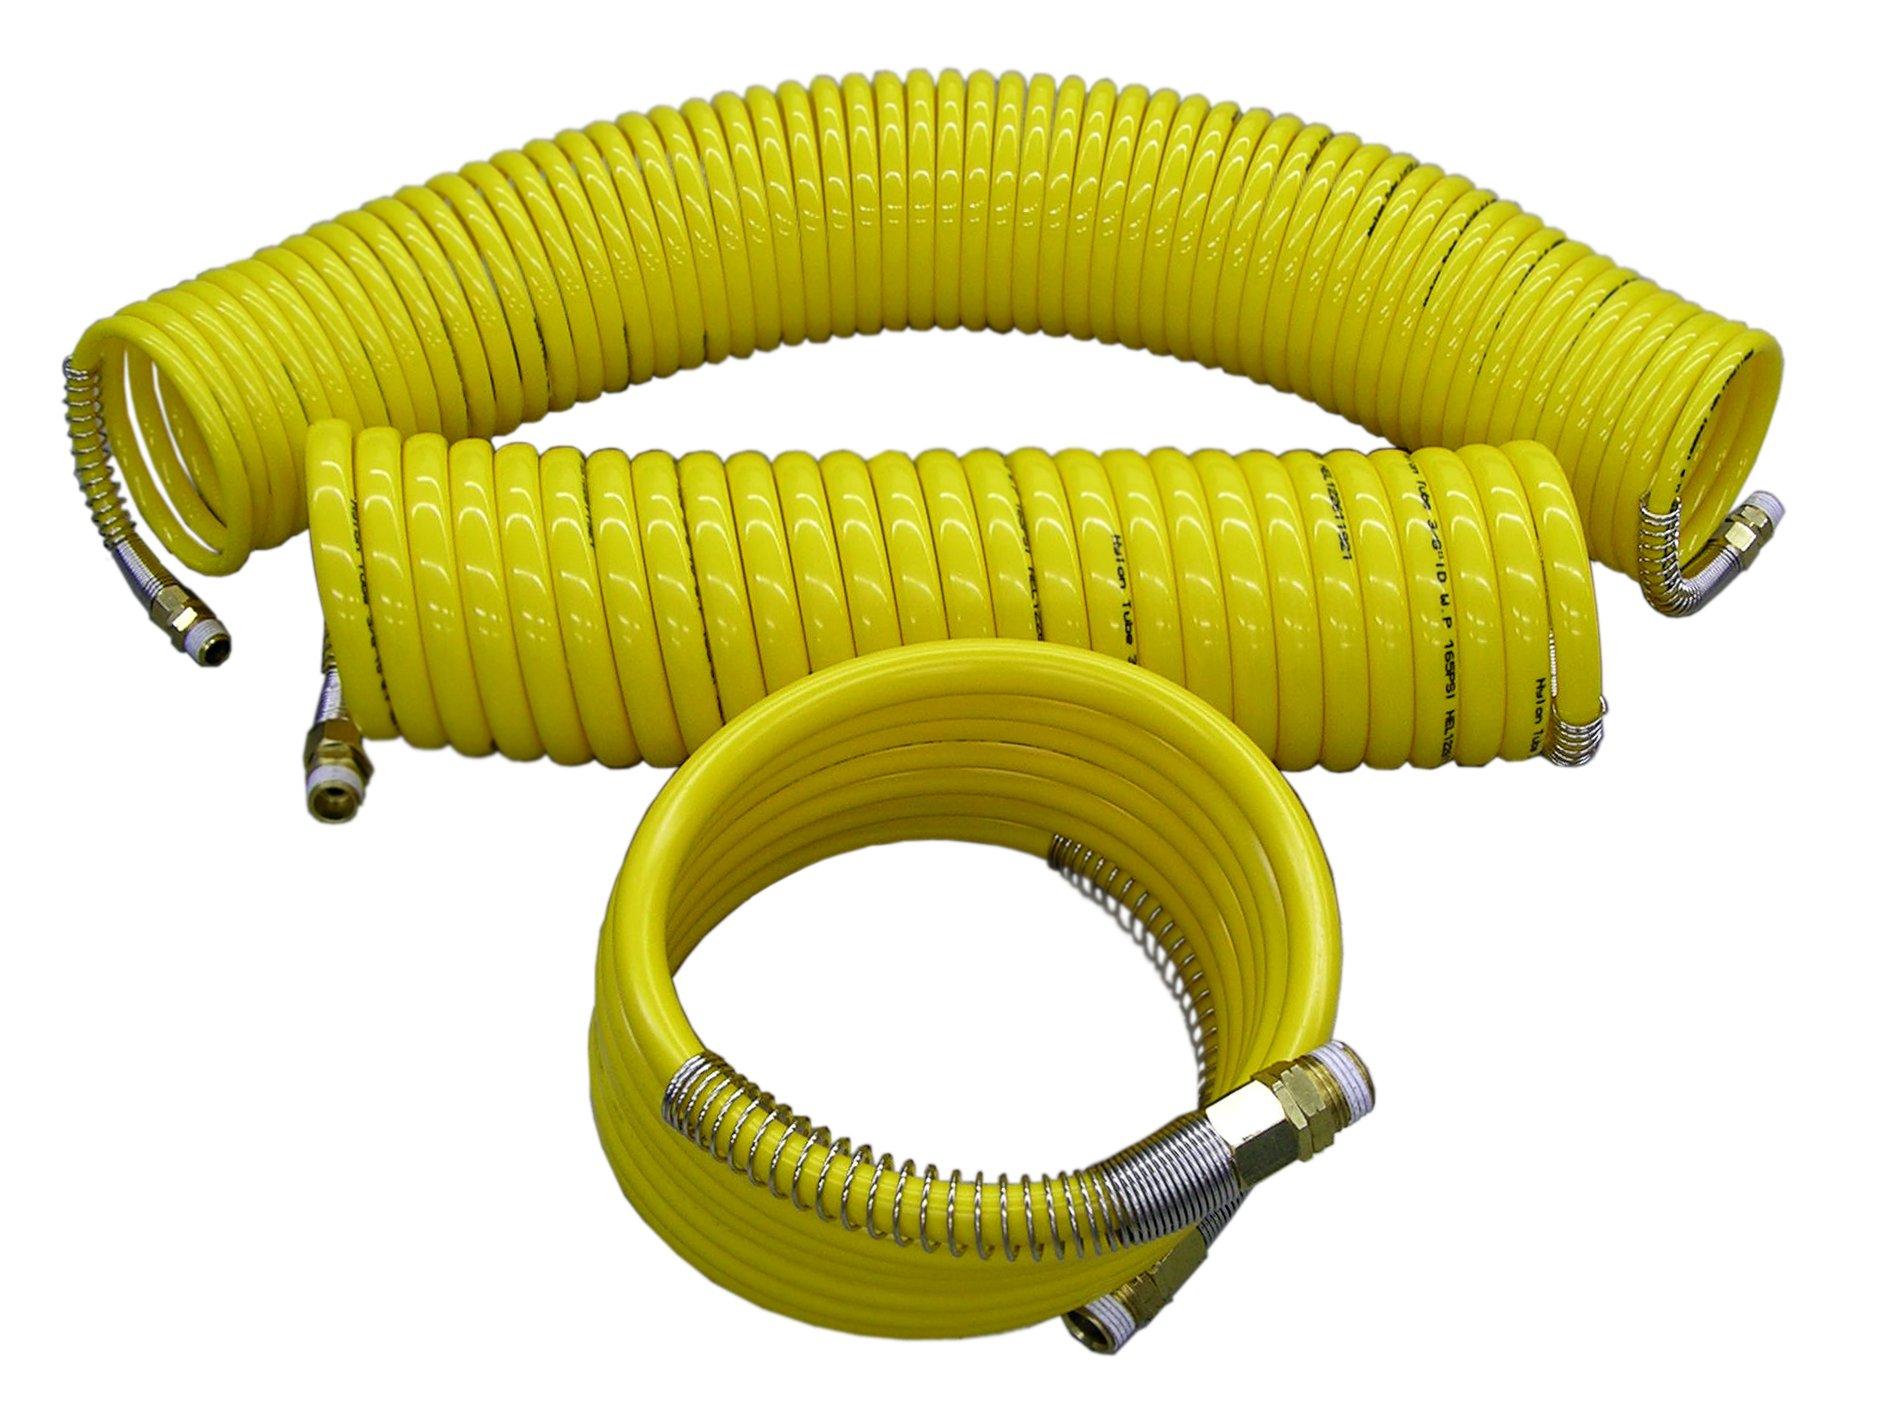 ATP  Nylon Spiral Hose, Yellow, 1/2'' ID, 12 feet Total Length/10 feet Working Length, 1/2'' NPT Male